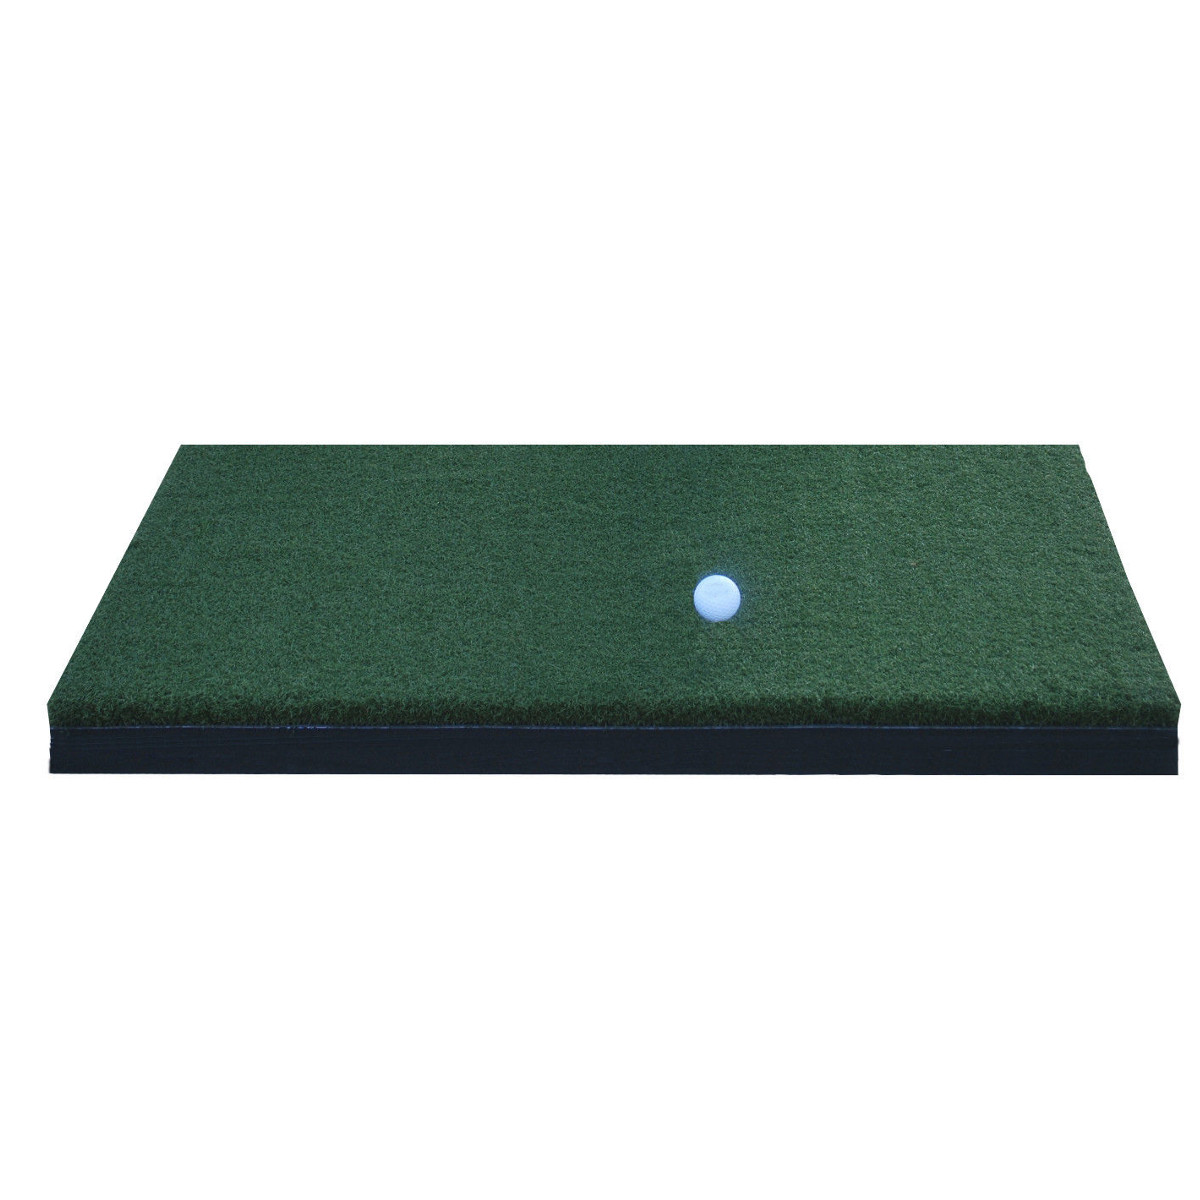 Nylon Golf Practice Mat Hitting Grass Driving Holder